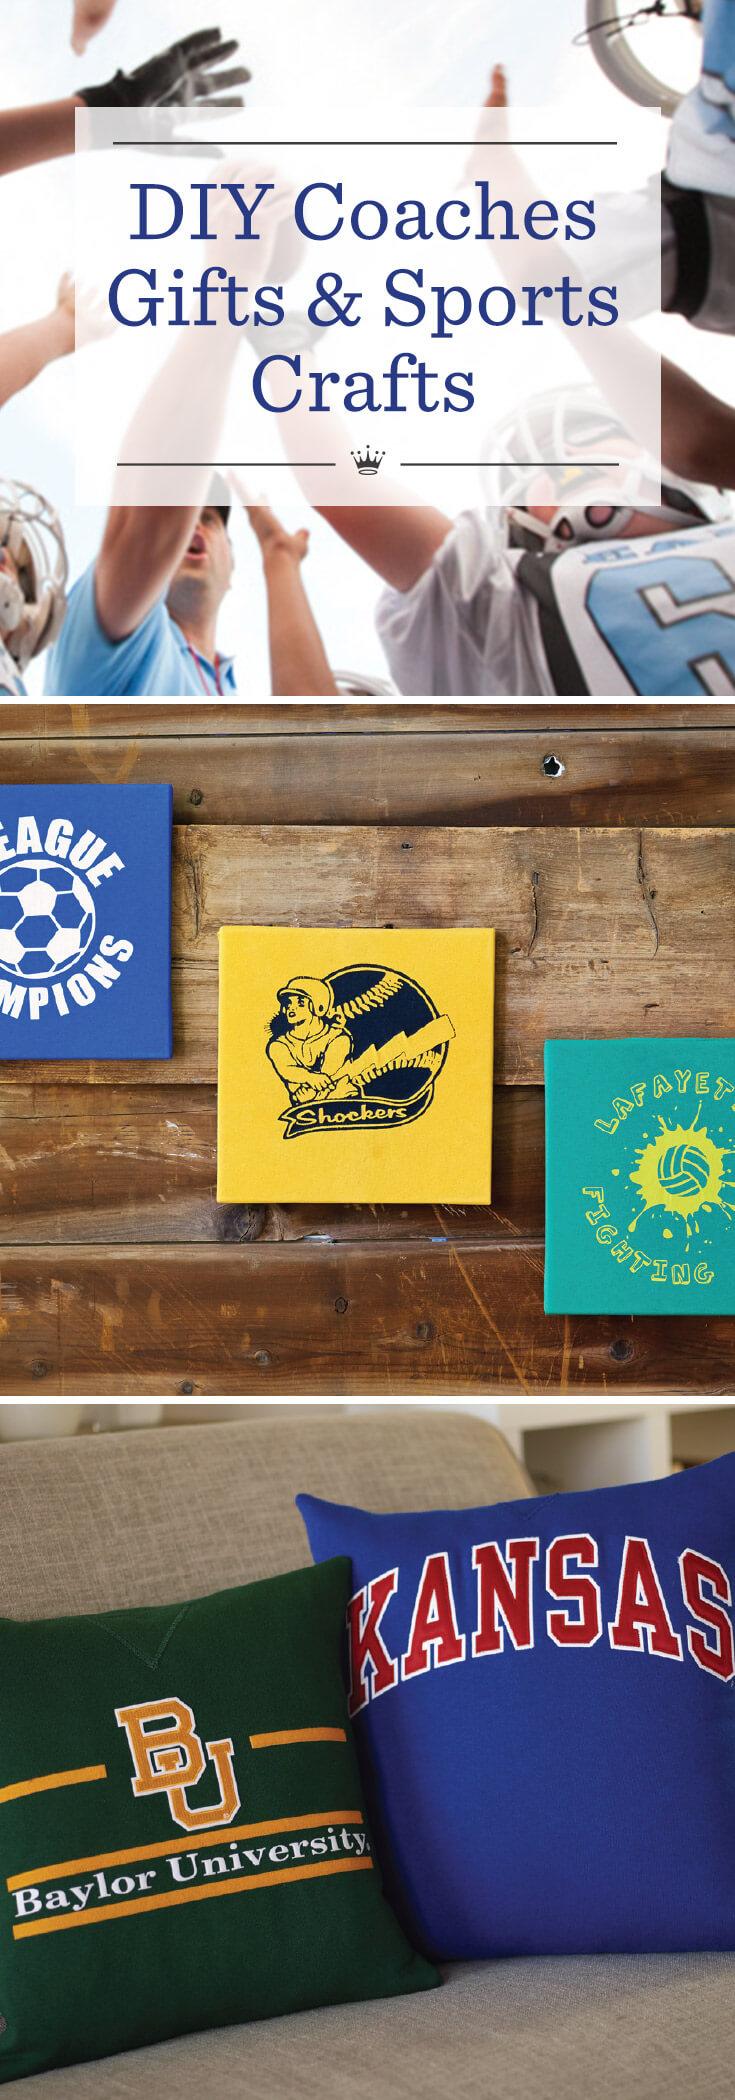 Coaches Gifts Hallmark Ideas Inspiration